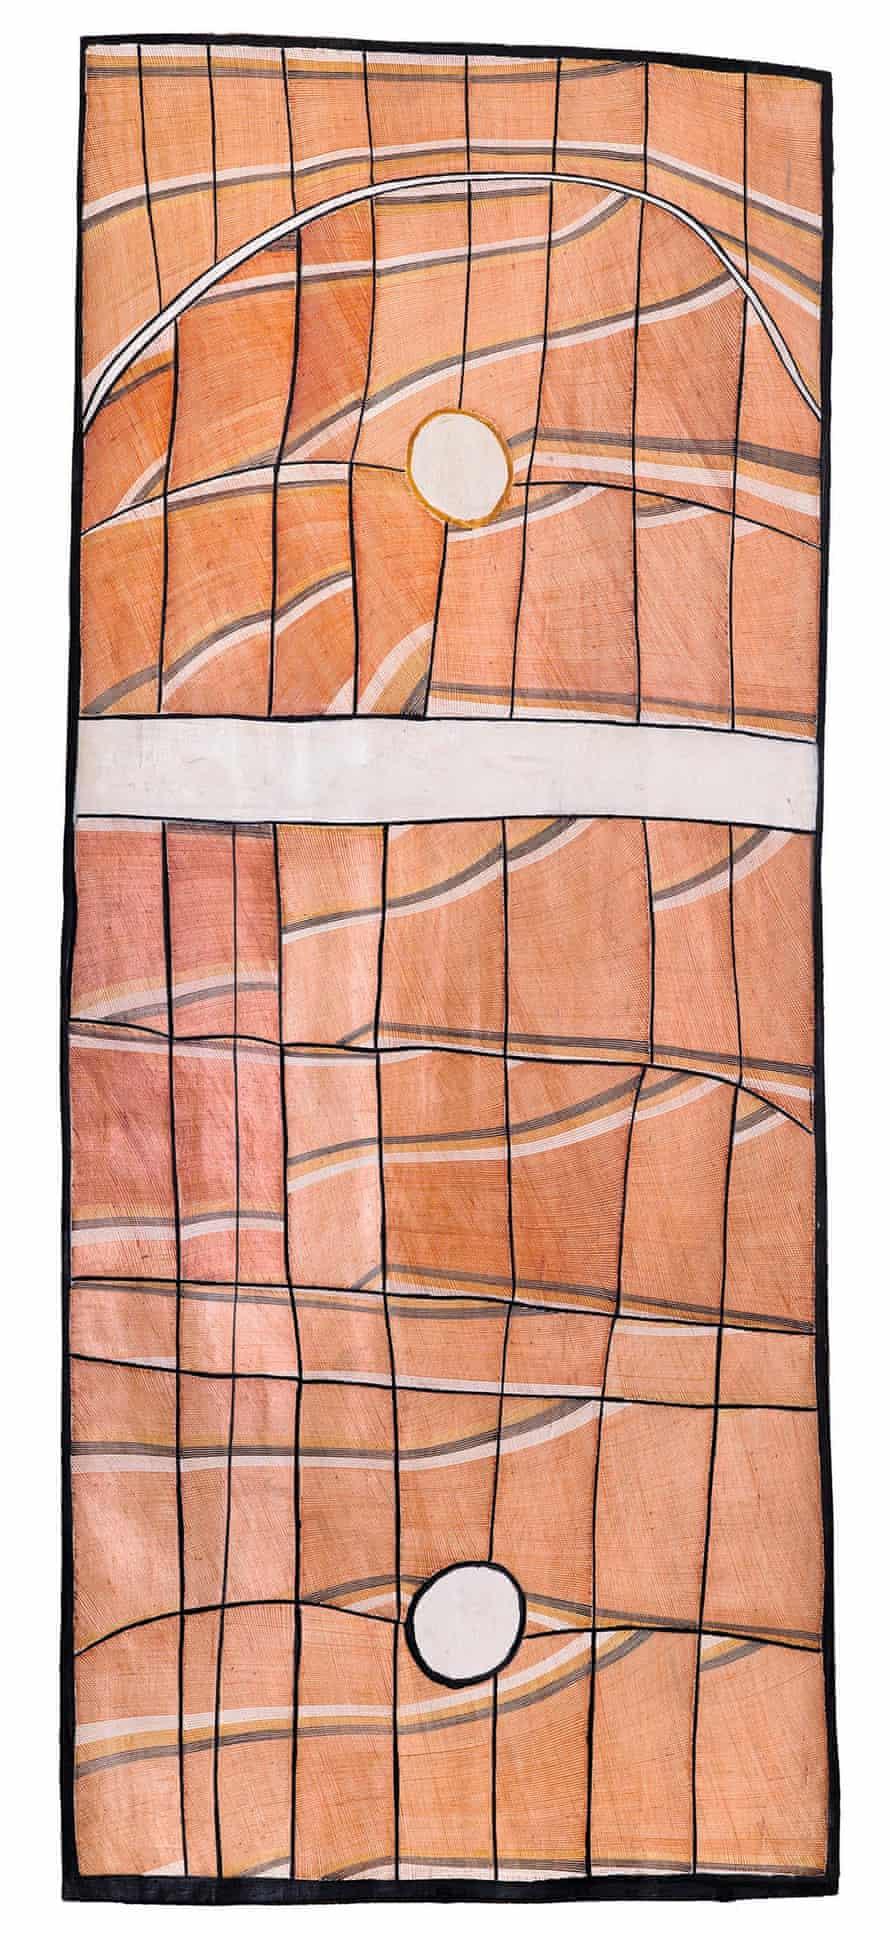 John Mawurndjul, Milmilngkan, 2008. Earth pigments on Stringybark (Eucalyptus tetrodonta)